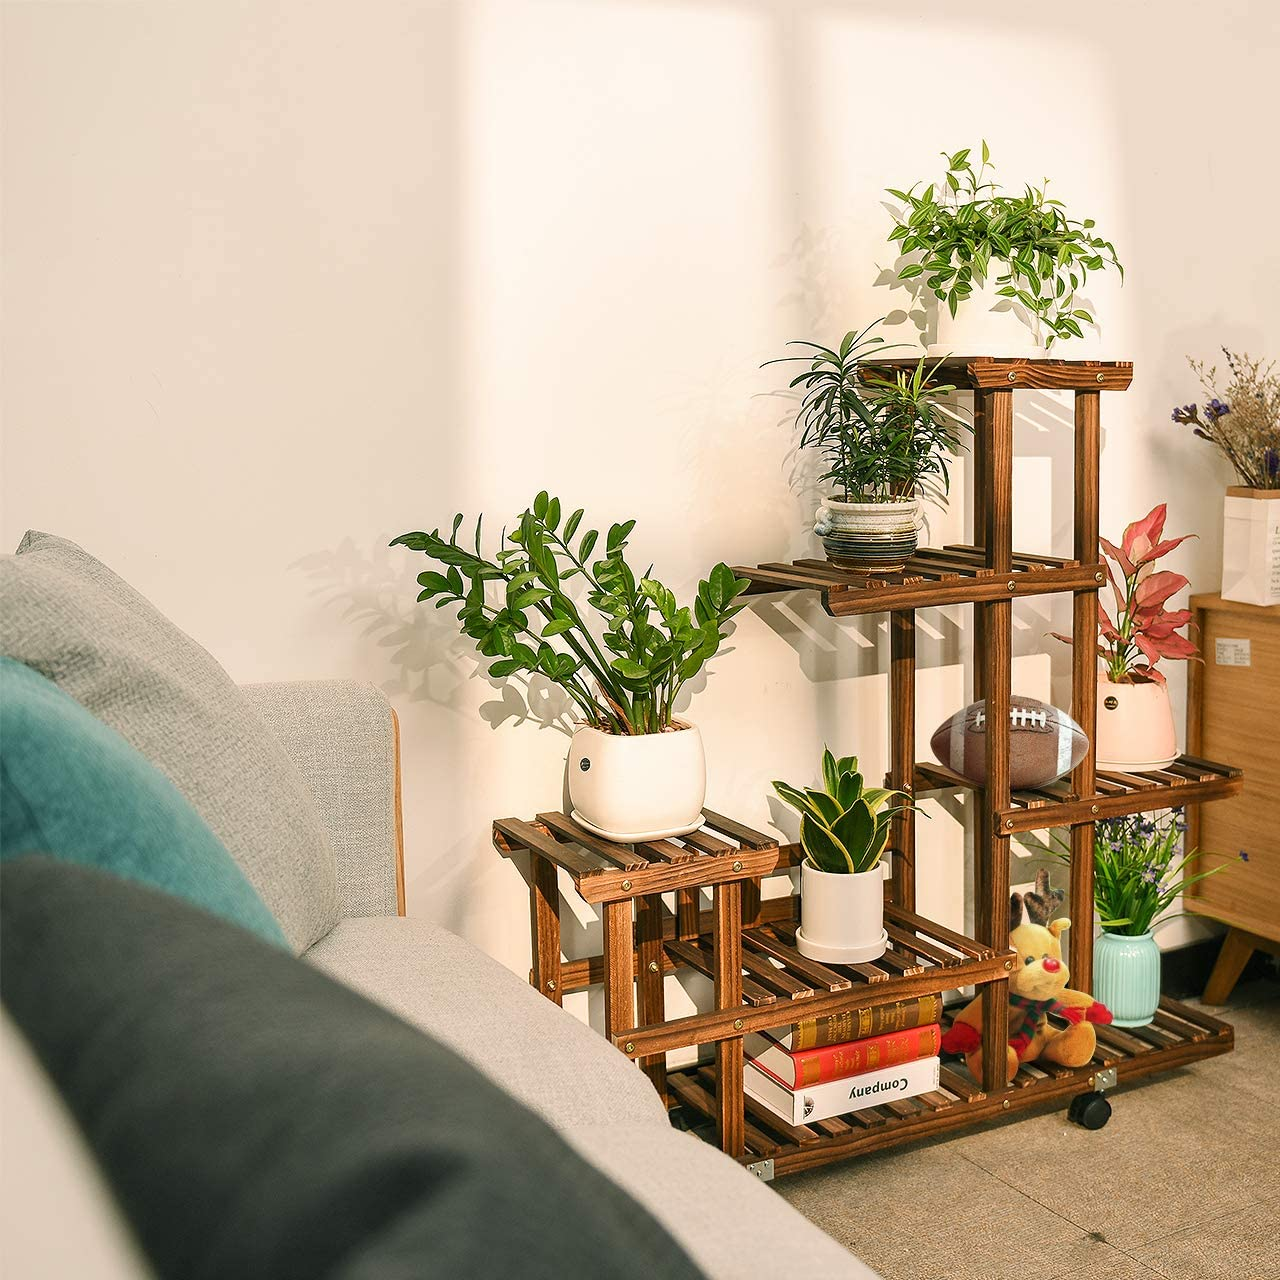 Buy cfmour Wood Plant Stand Indoor Outdoor, Wooden Plant Display ...